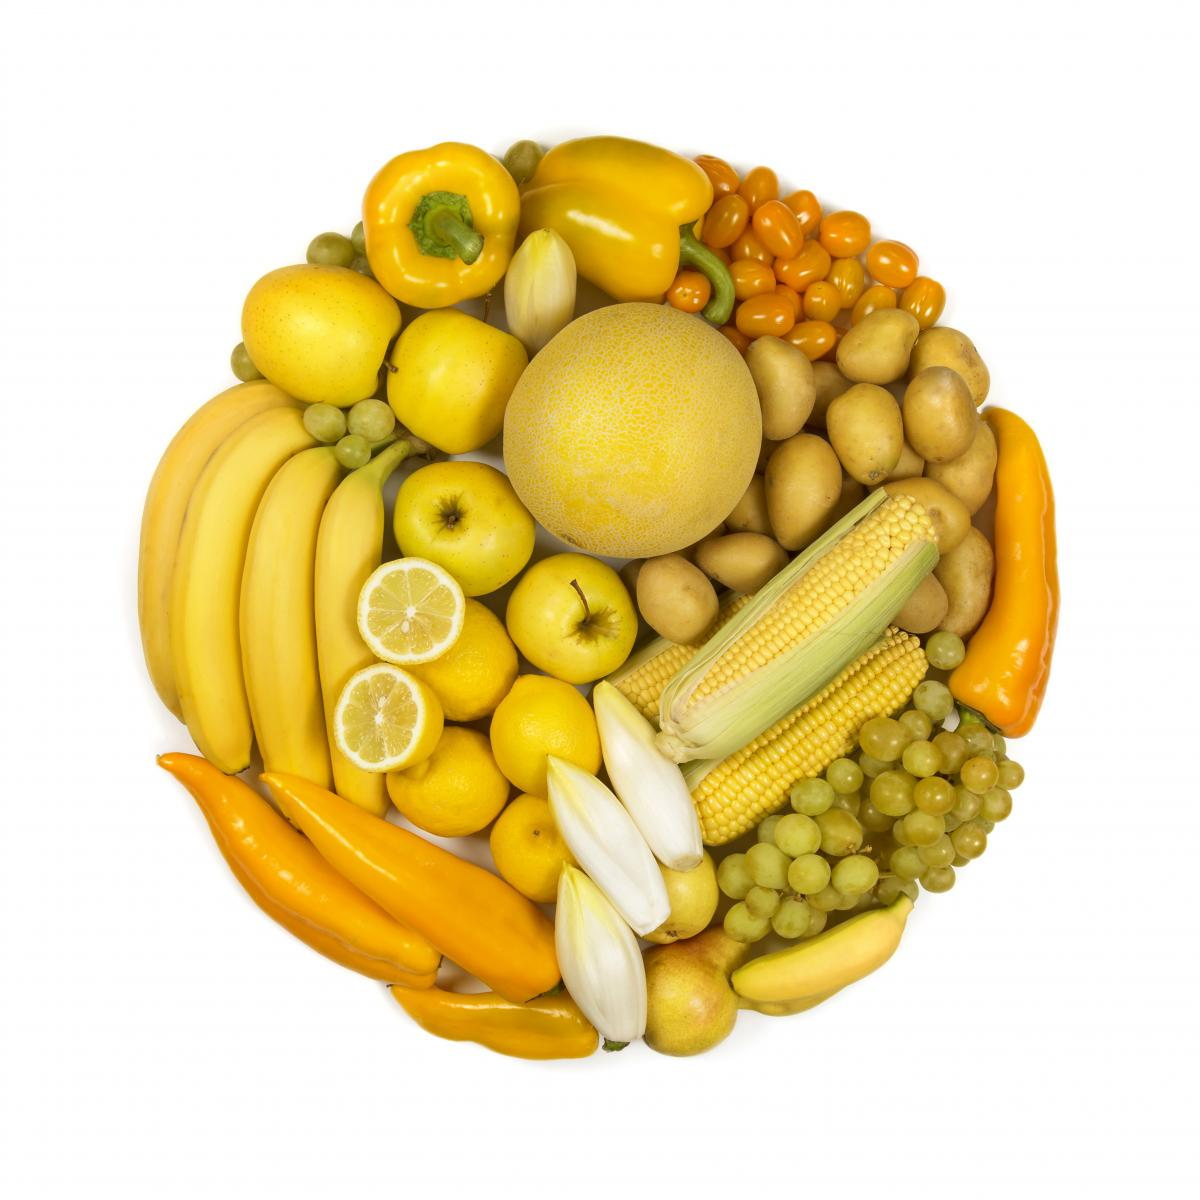 You Are What You Eat - เมนูสุขภาพ กินง่าย ไม่ปวดหัว